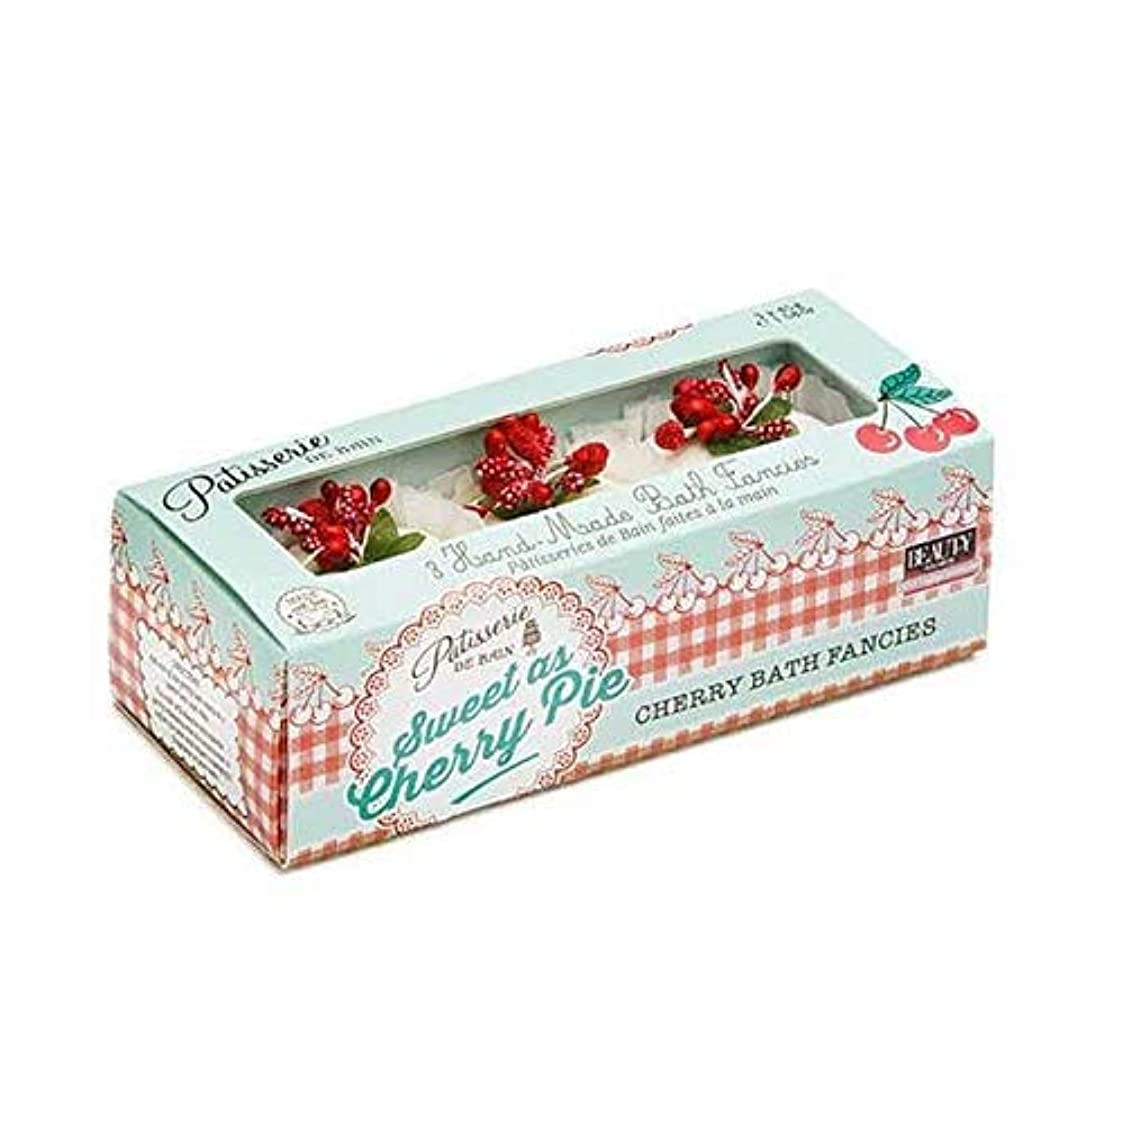 [Patisserie de Bain ] チェリーパイ風呂メルト45グラムのように甘いパティスリー?ド?ベイン - Patisserie de Bain Sweet as Cherry Pie Bath Melt 45g...